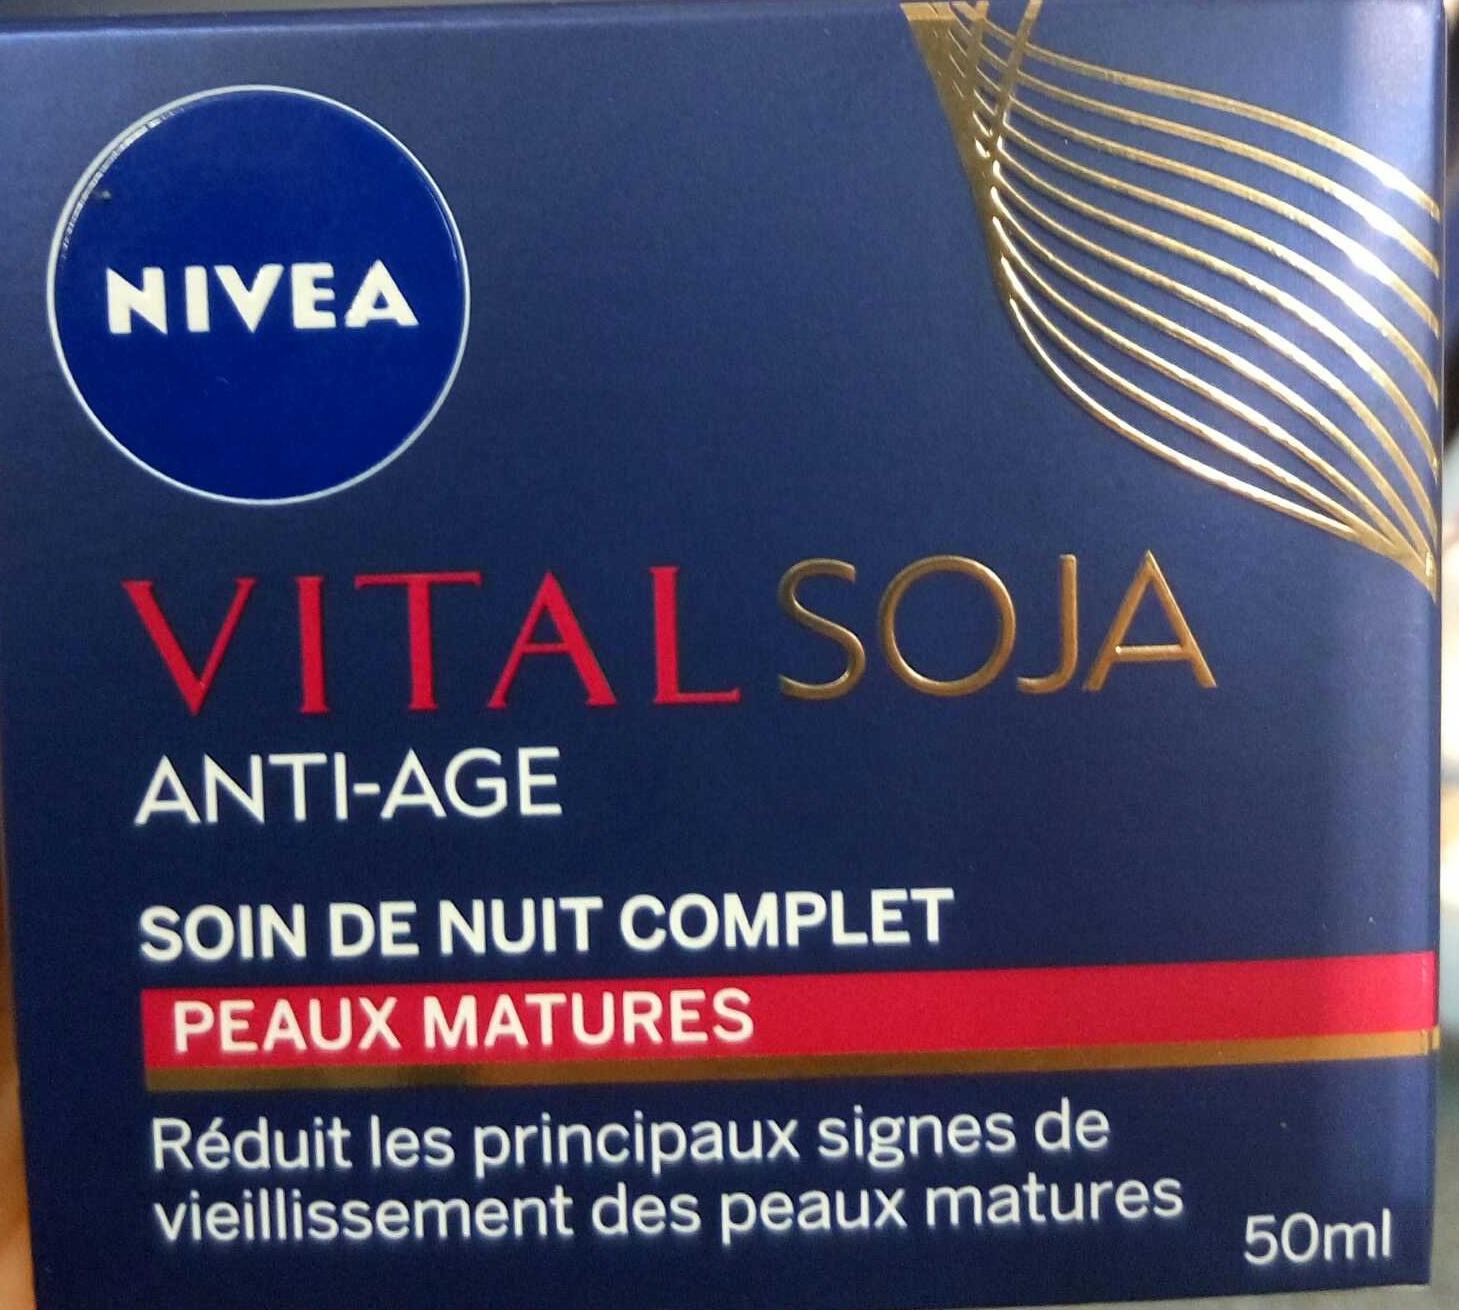 Vital Soja anti-âge soin de nuit complet - Product